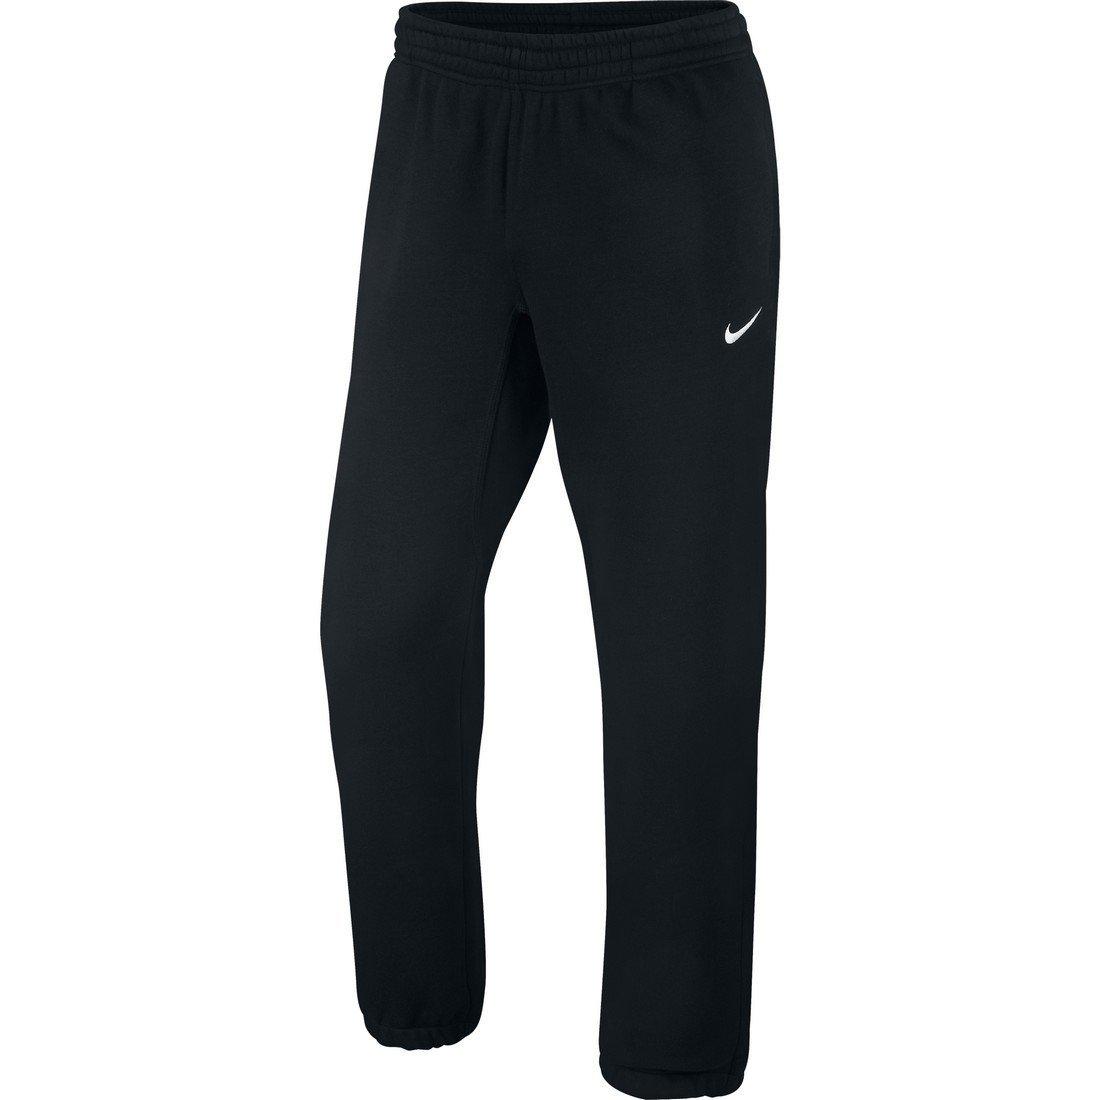 6943cedbac65 Get Quotations · Nike Mens Club Swoosh Cuffed Pants Small Black White